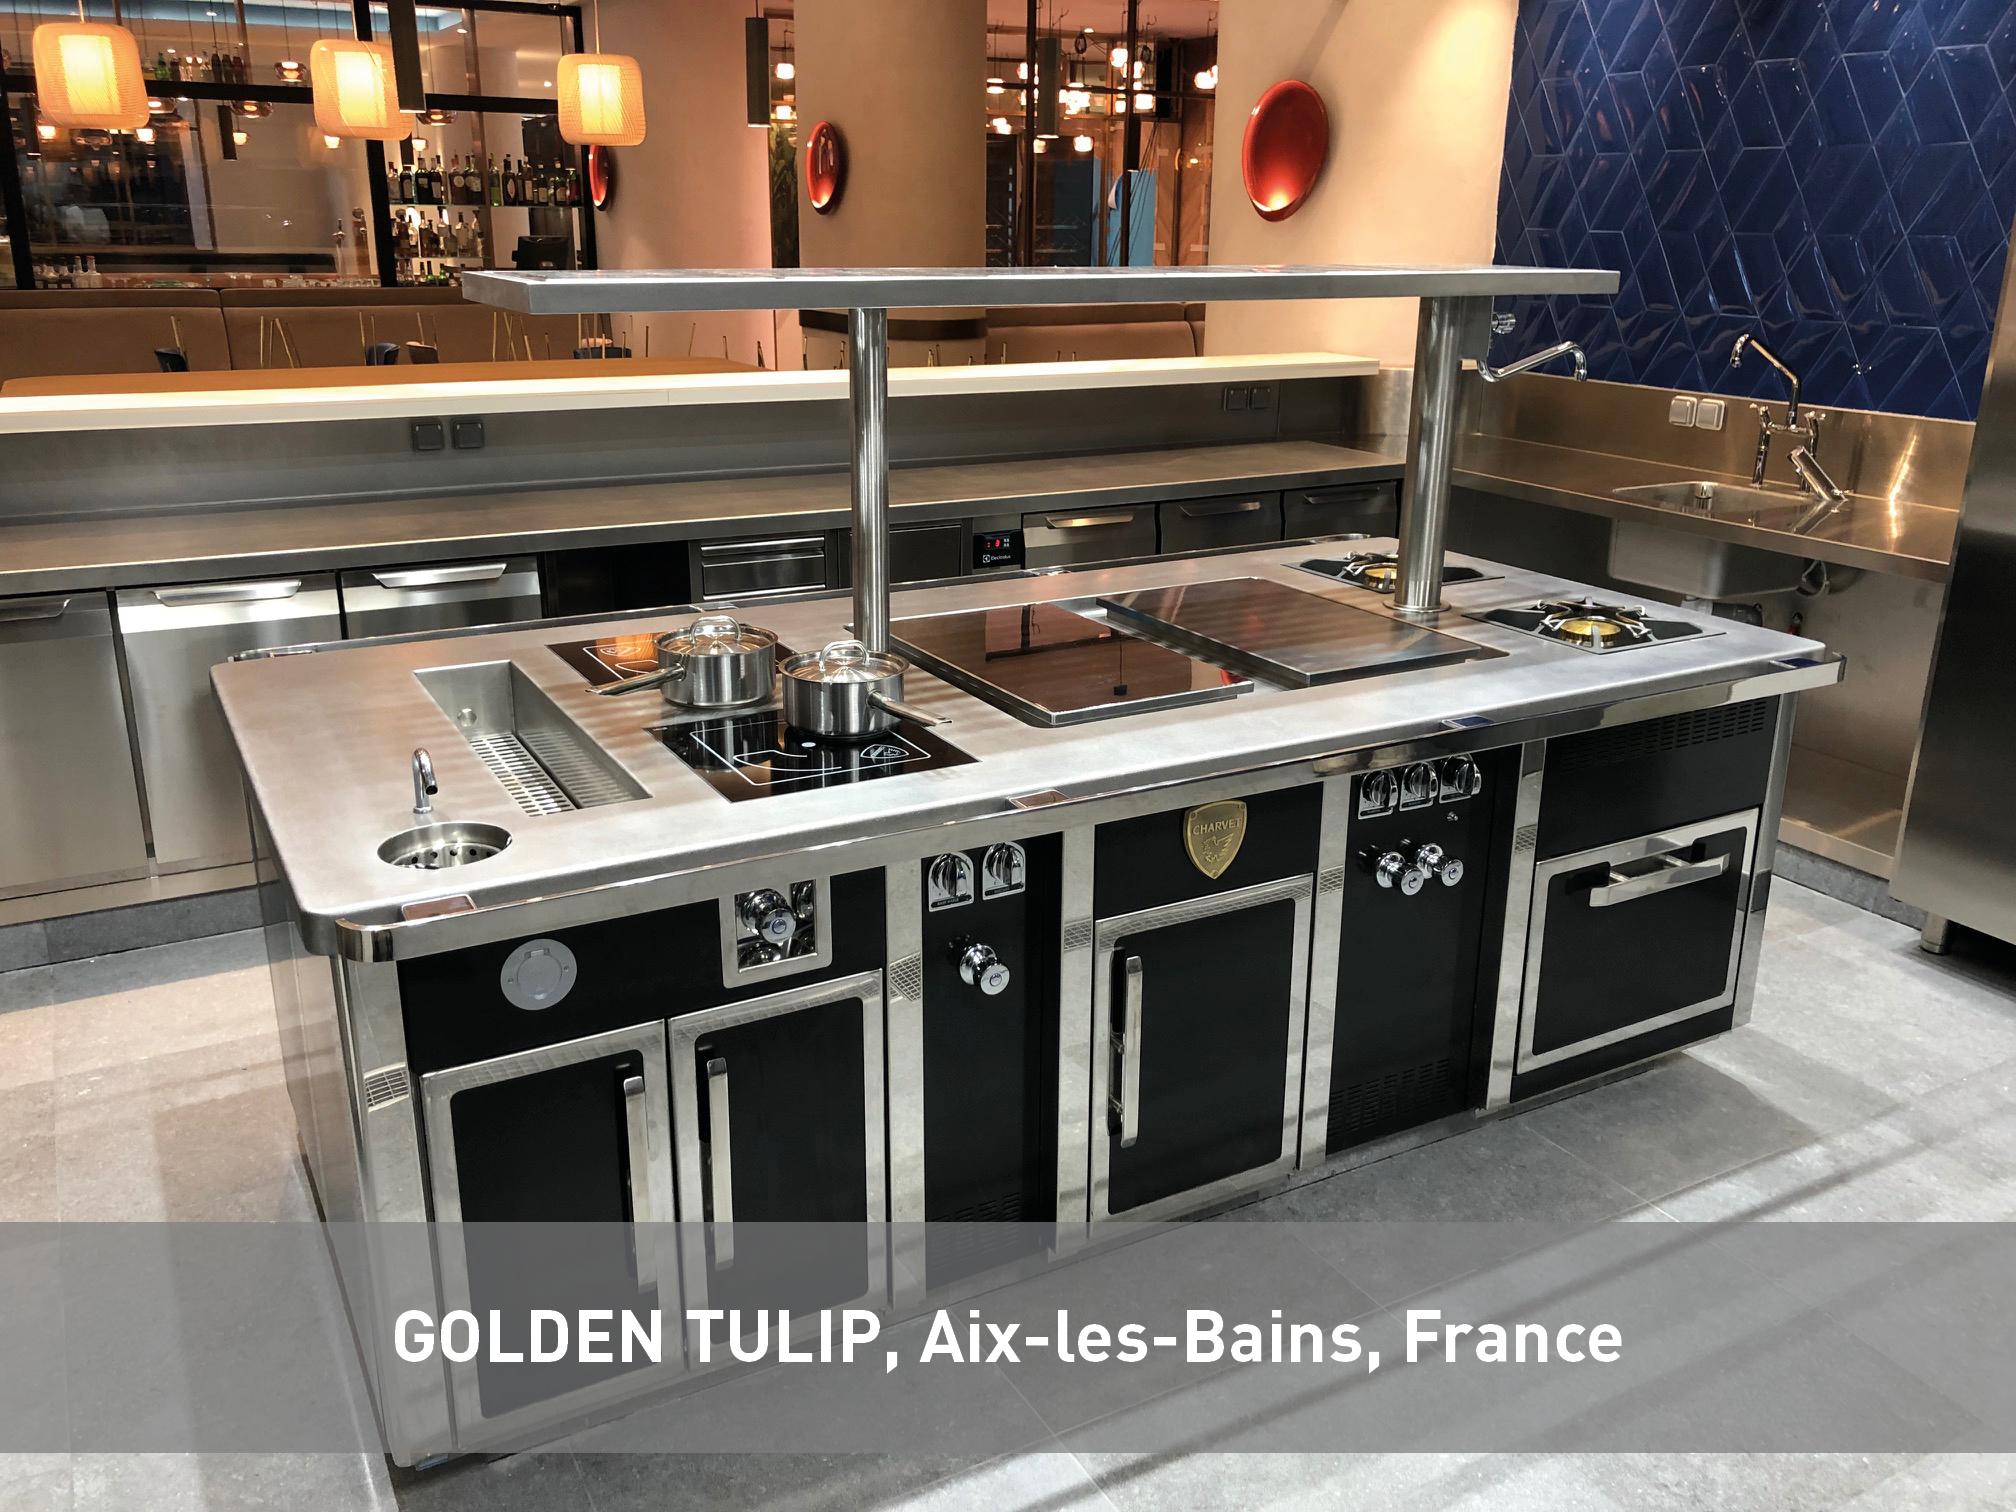 Golden Tulip Aix-les-Bains France Charvet